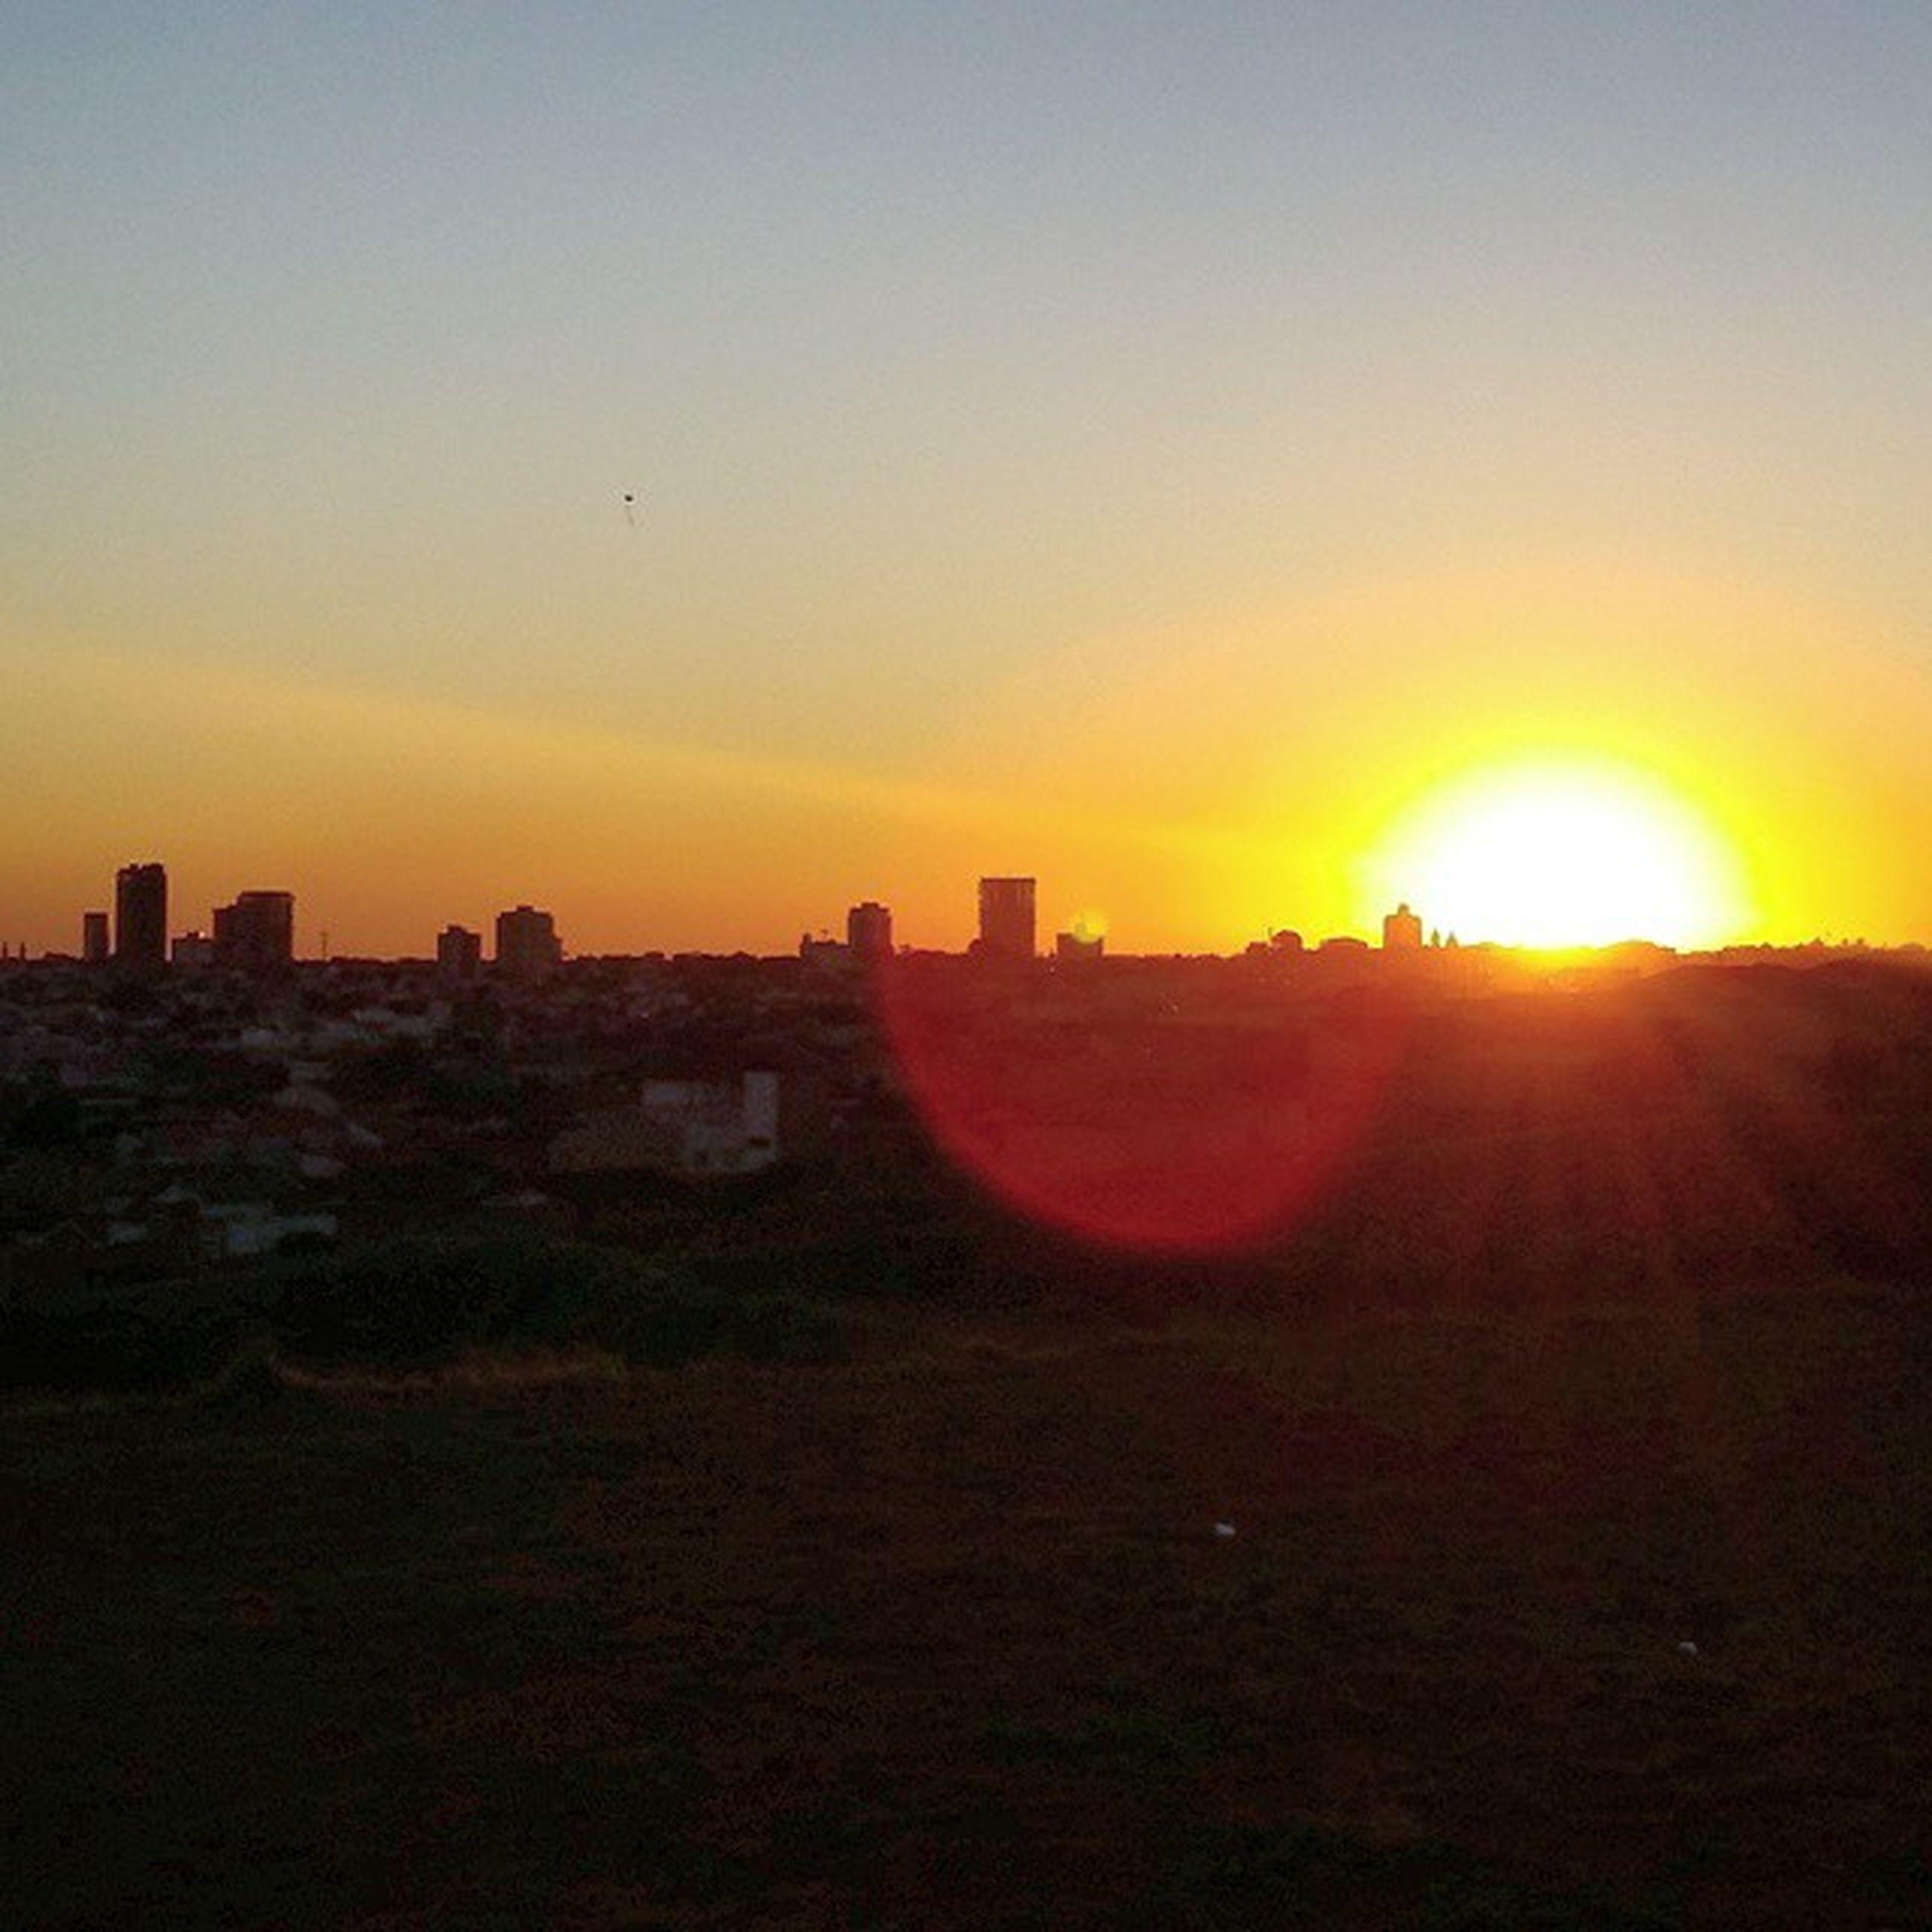 sunset, sun, orange color, built structure, building exterior, architecture, sunlight, lens flare, sunbeam, silhouette, sky, copy space, landscape, city, scenics, clear sky, nature, beauty in nature, tranquil scene, outdoors